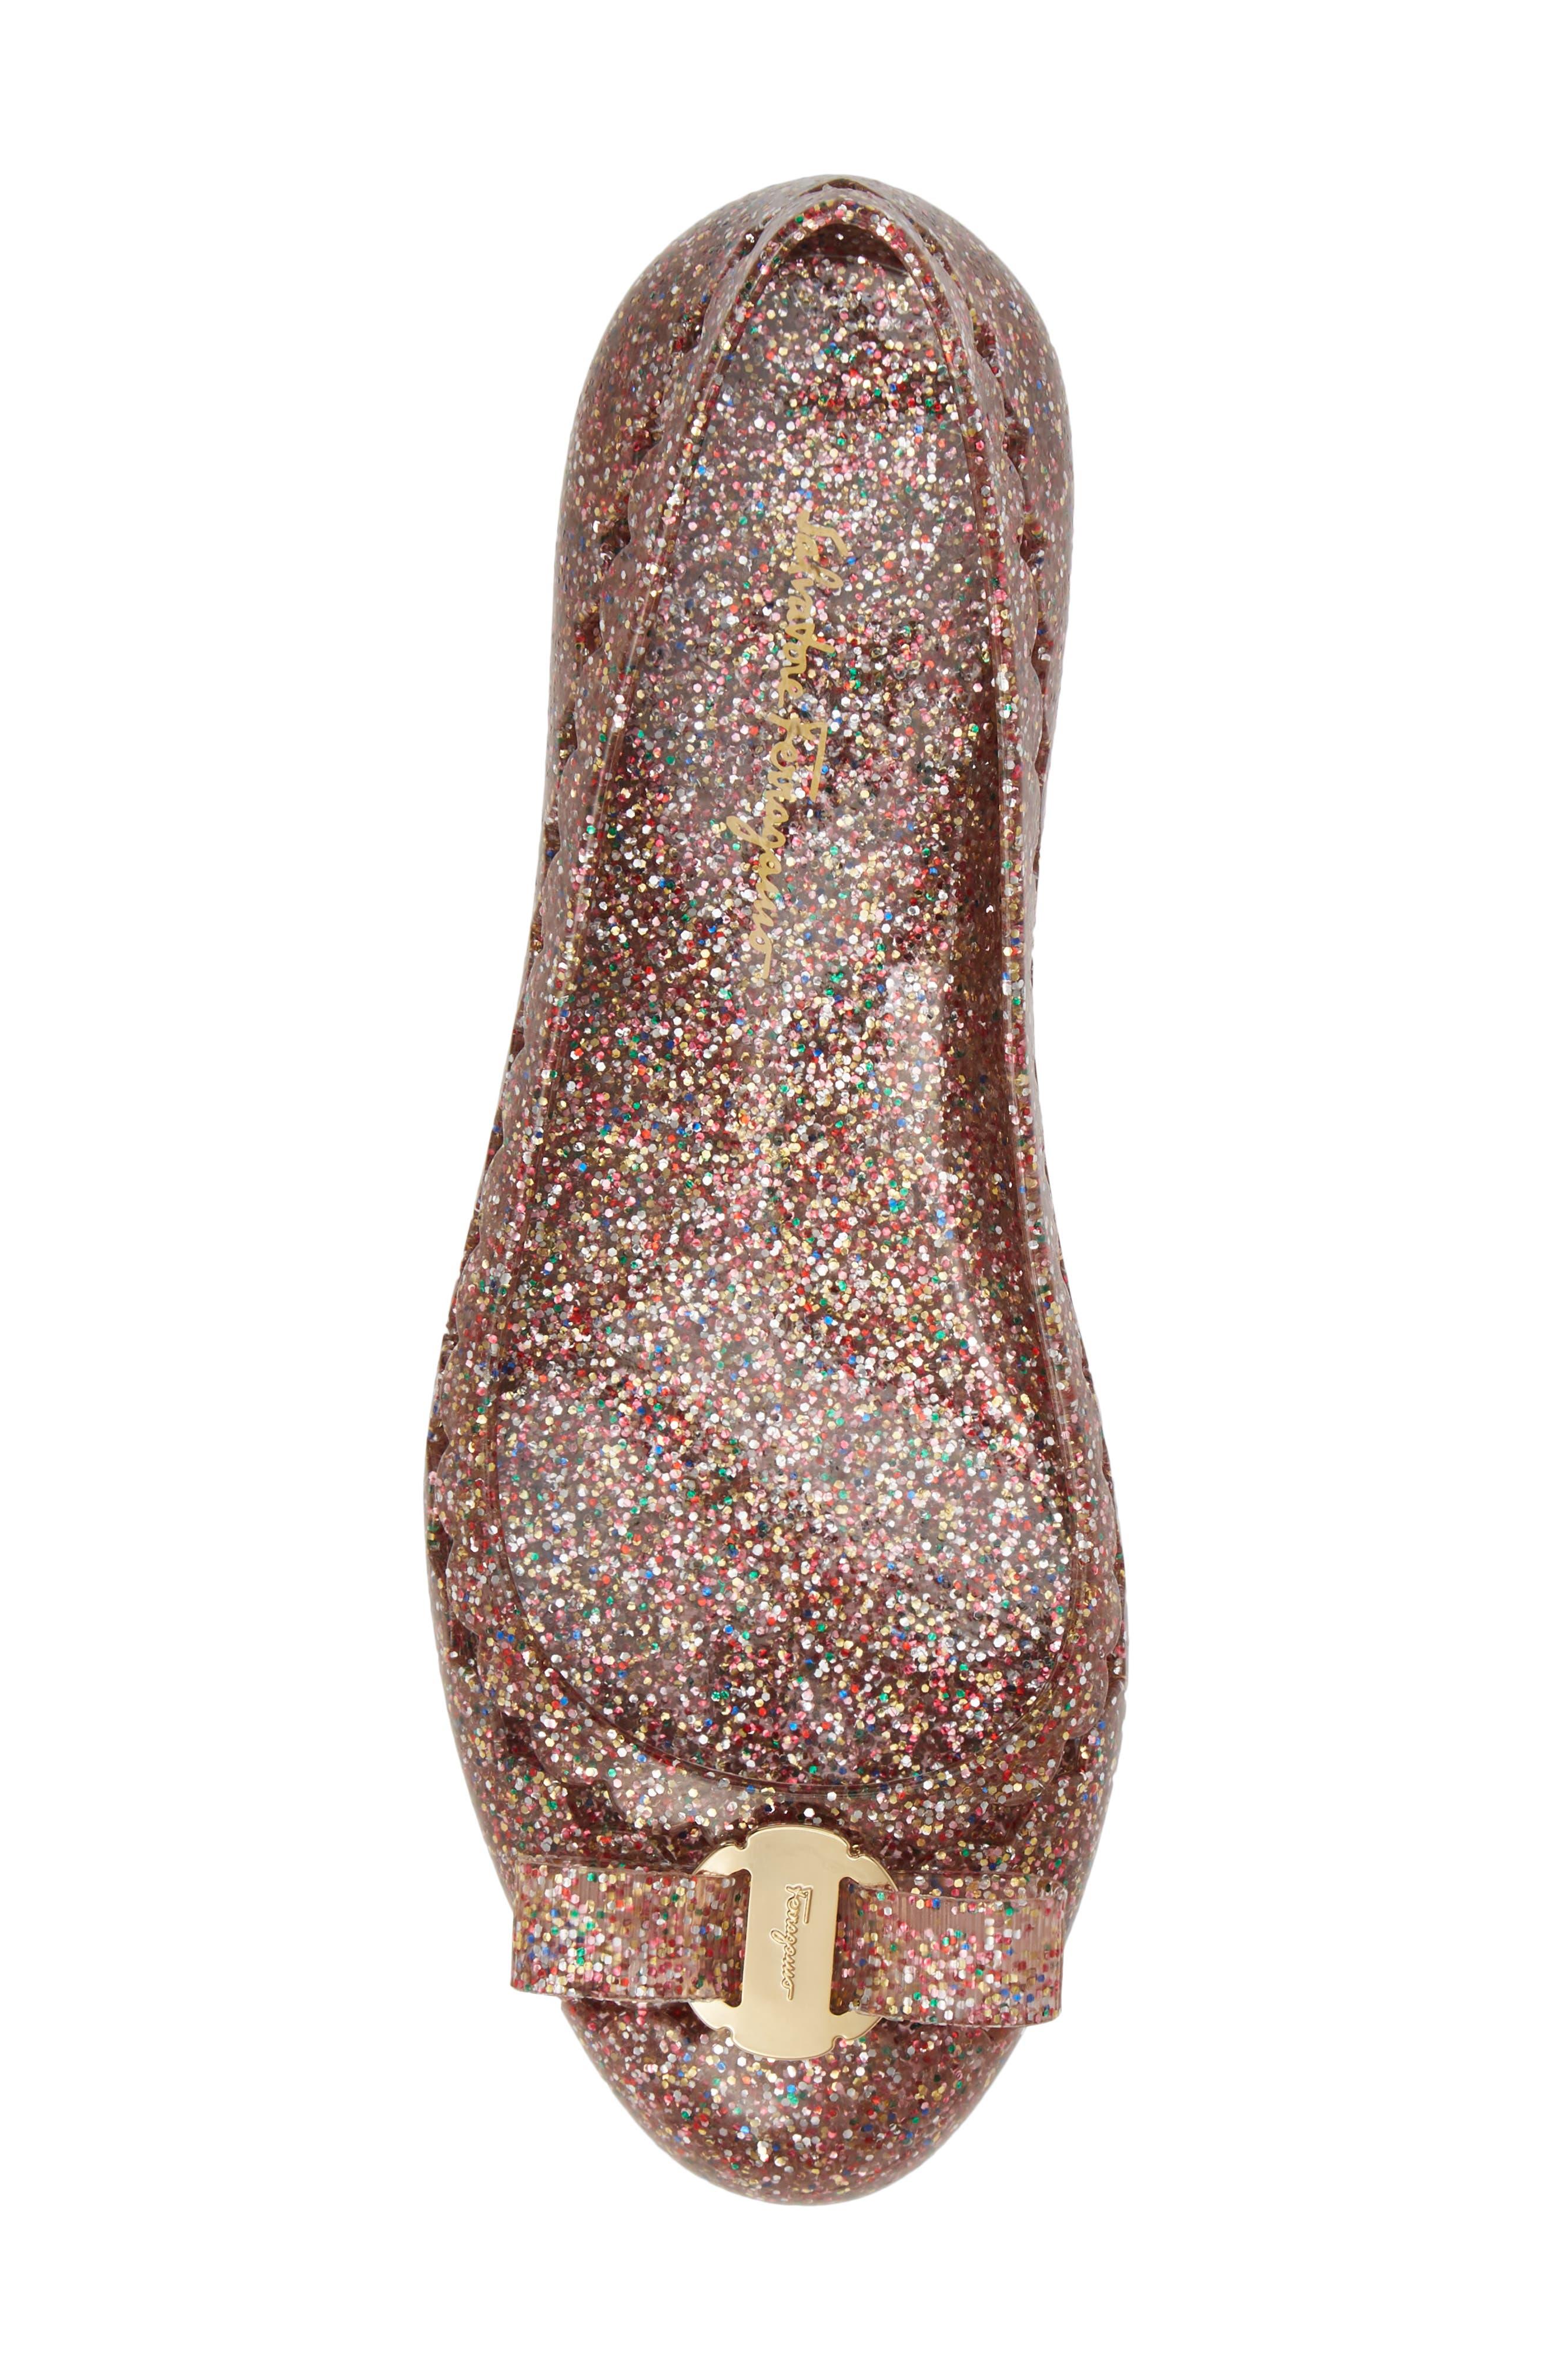 Jelly Ballerina Flat,                             Alternate thumbnail 5, color,                             MULTICOLOR GLITTER